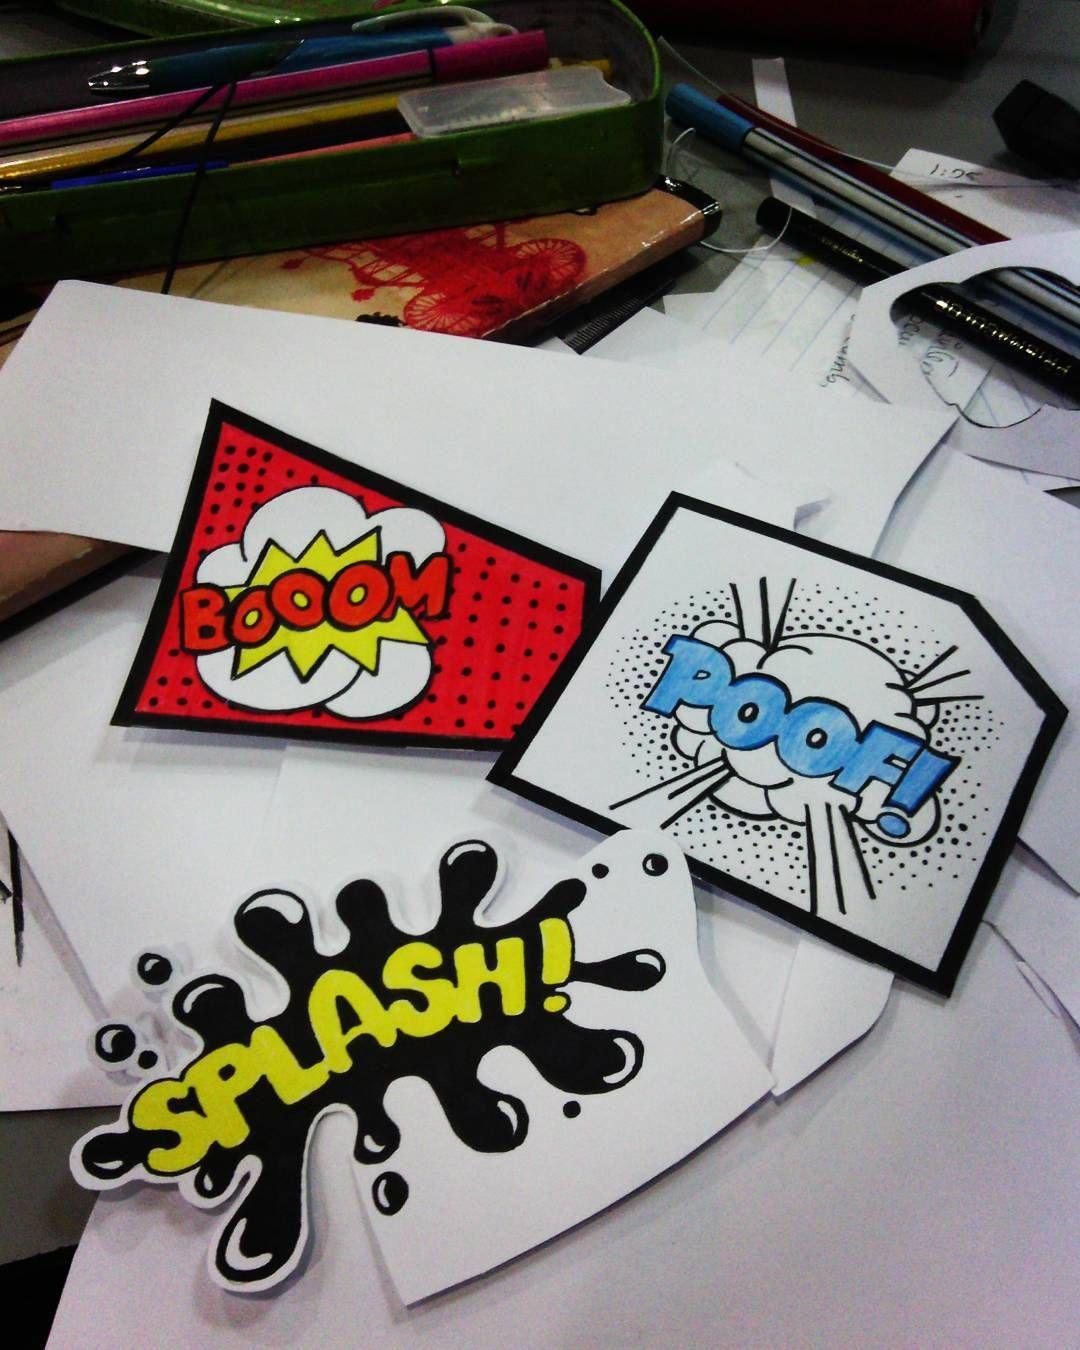 """I  Cómic #DecorandoaMisCuadernos #Comics #Comic #ComicArt #Proceso #Dibujo #Diseño #DesingComics #Caracas #Venezuela"""